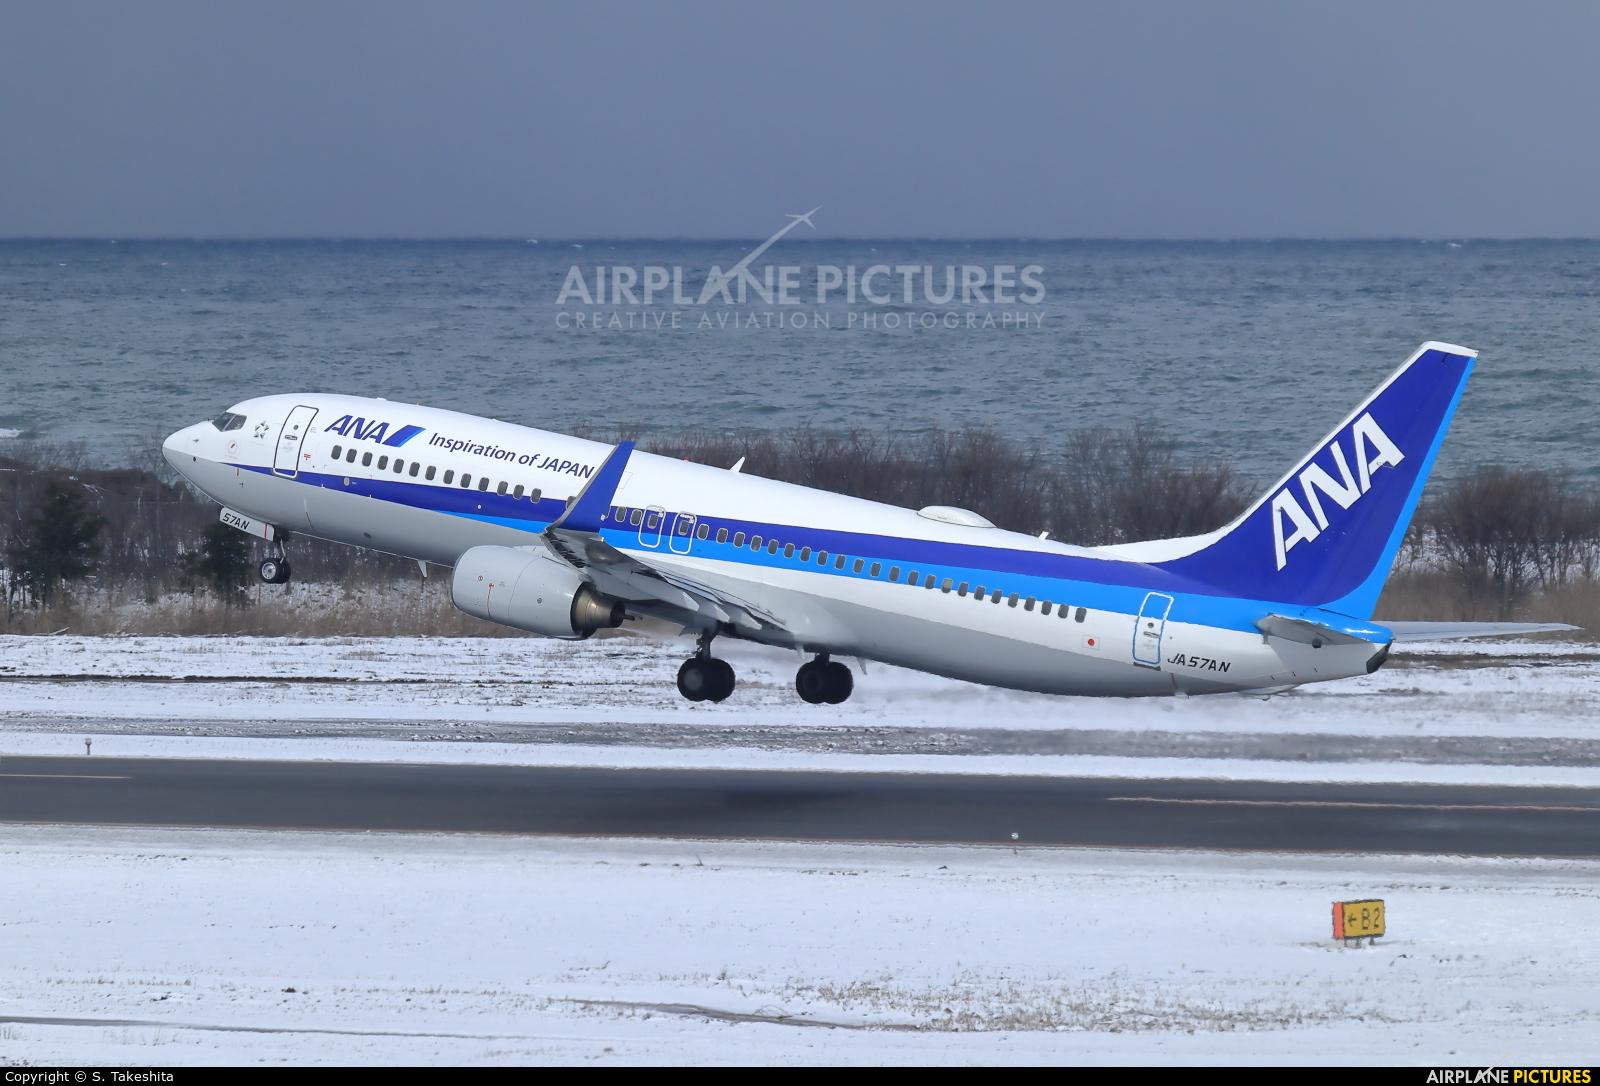 ANA - All Nippon Airways JA57AN aircraft at Niigata